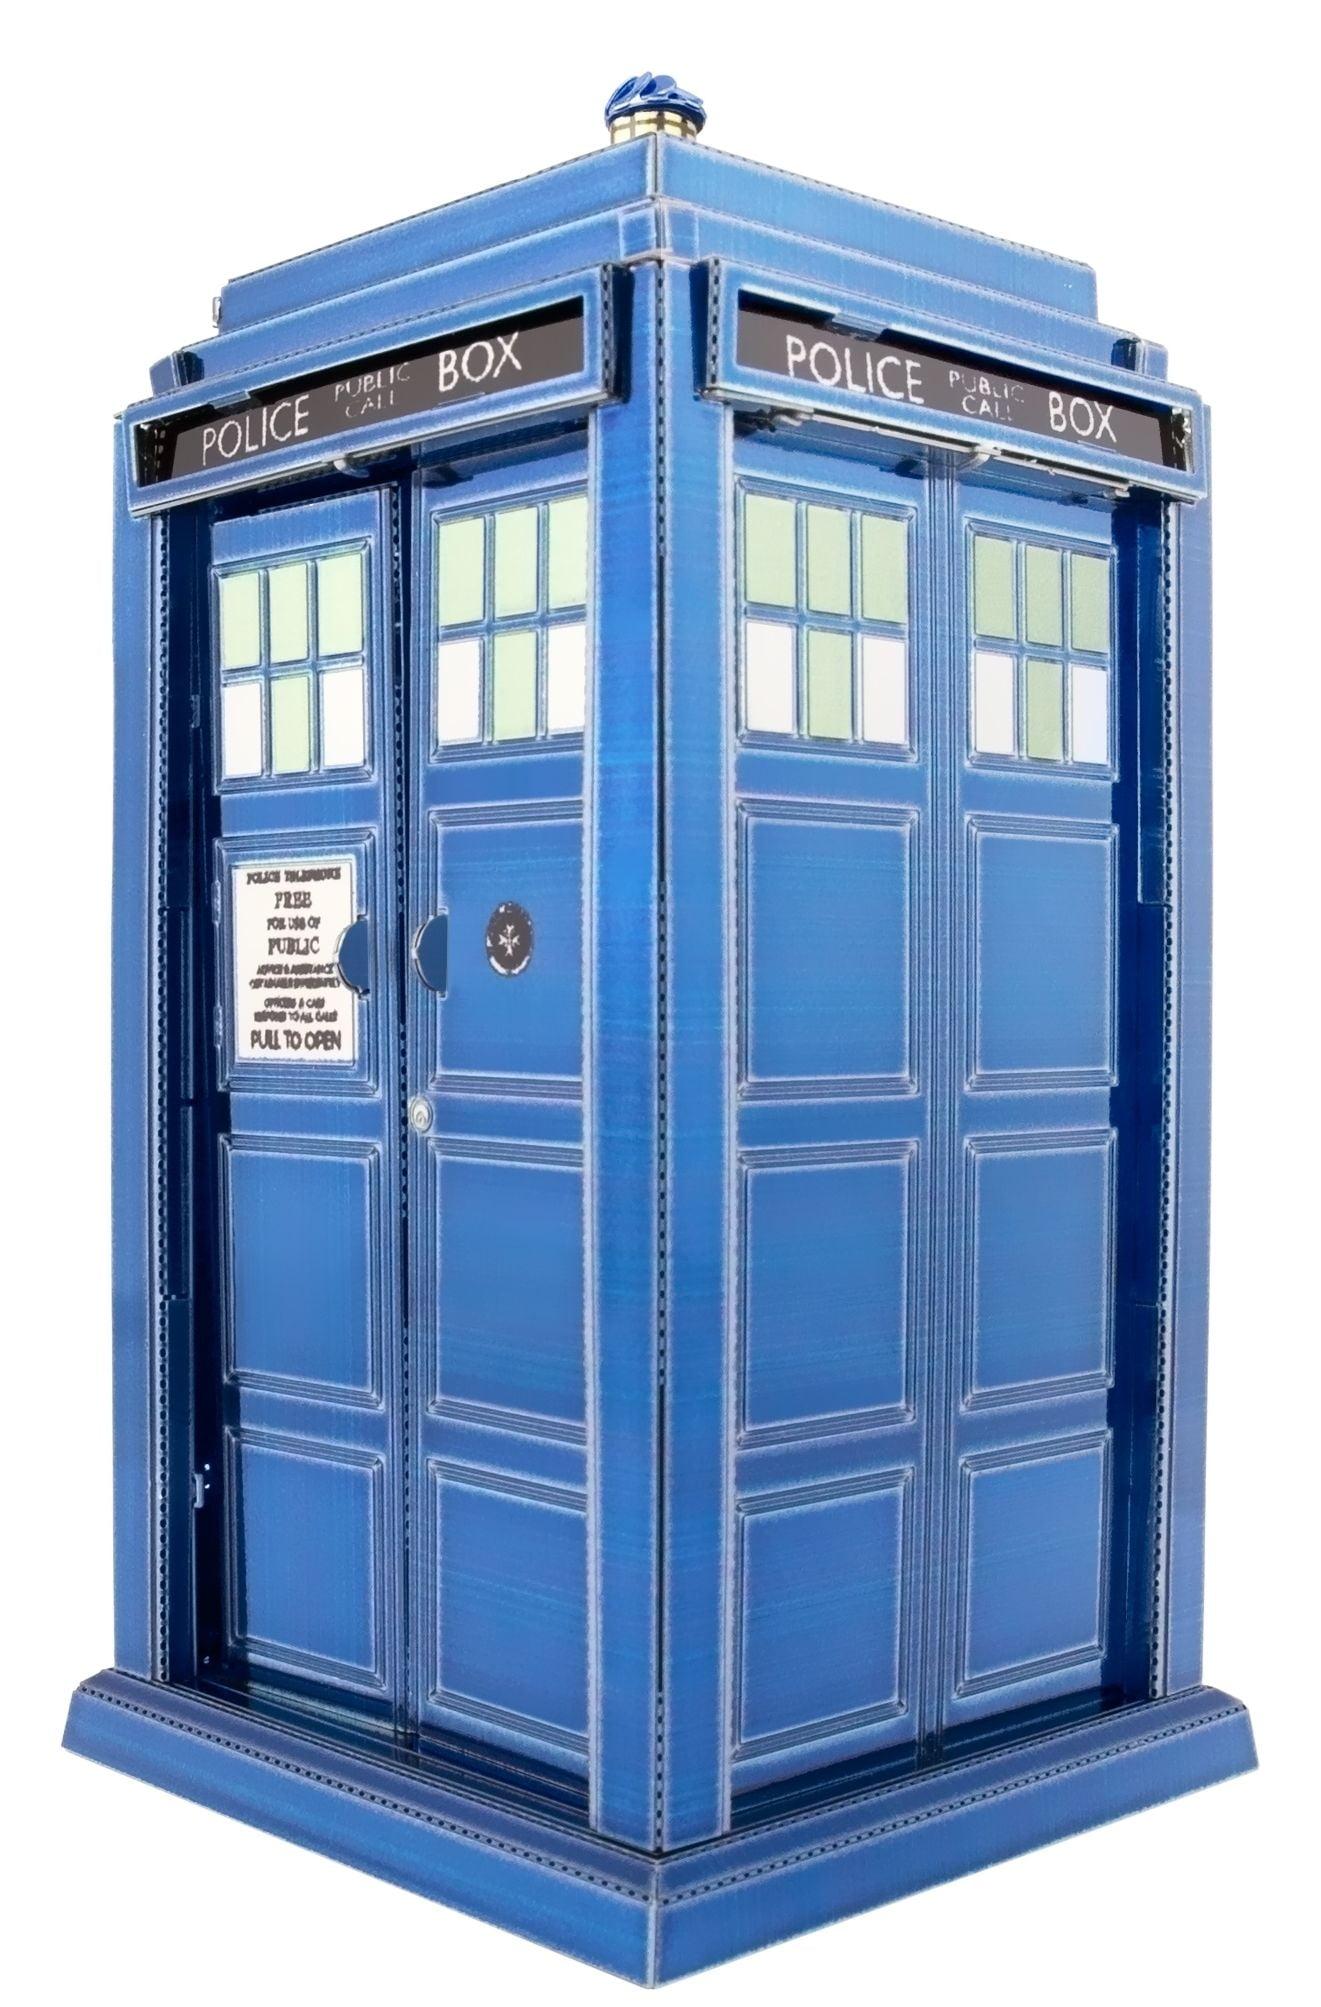 fascinations metal earth doctor who tardis kit hobbies